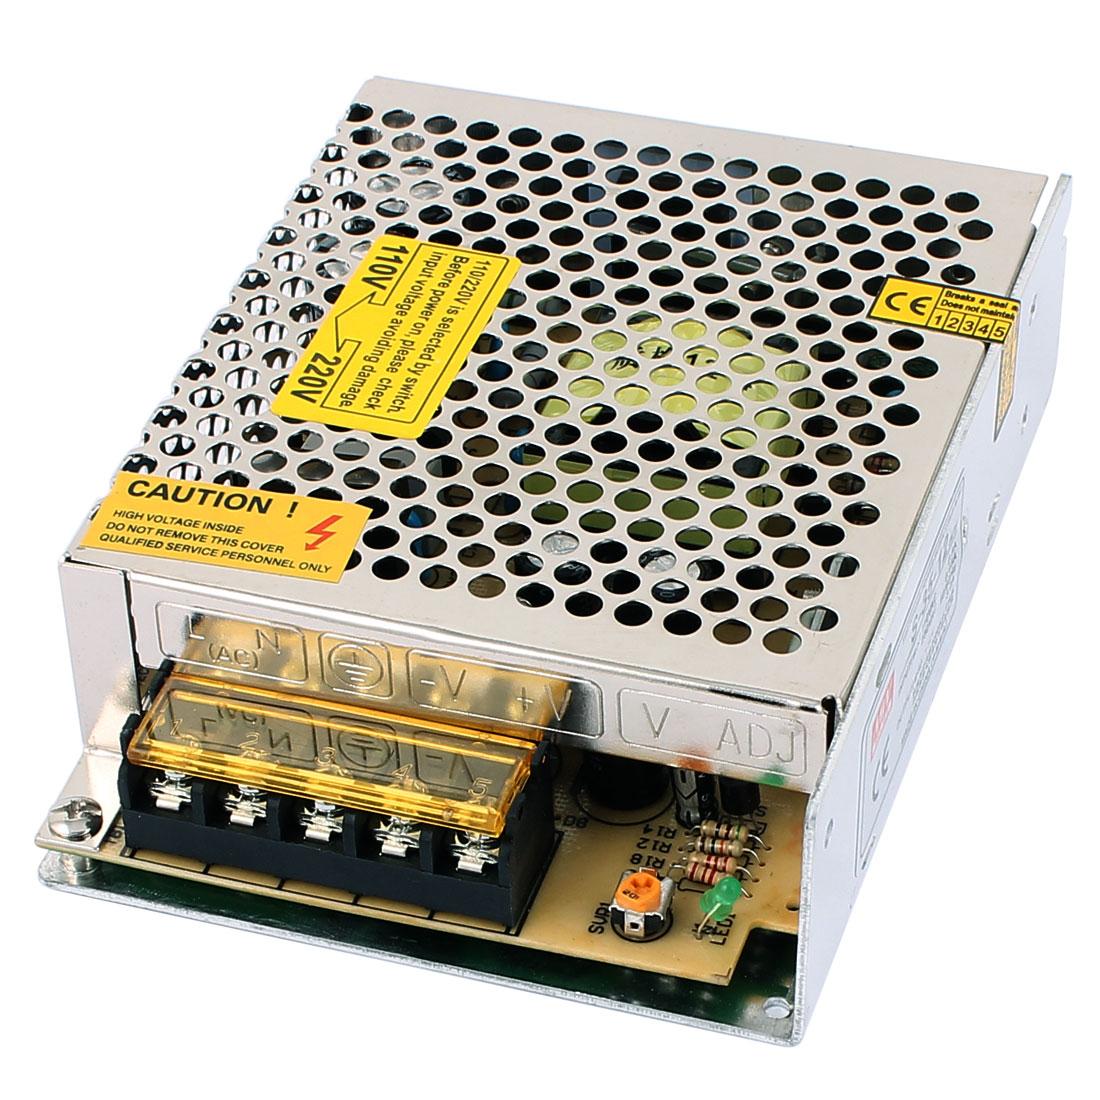 AC 110-230V 50/60Hz DC 12V 3.0A Switching Power Supply Driver for LED Strip Light